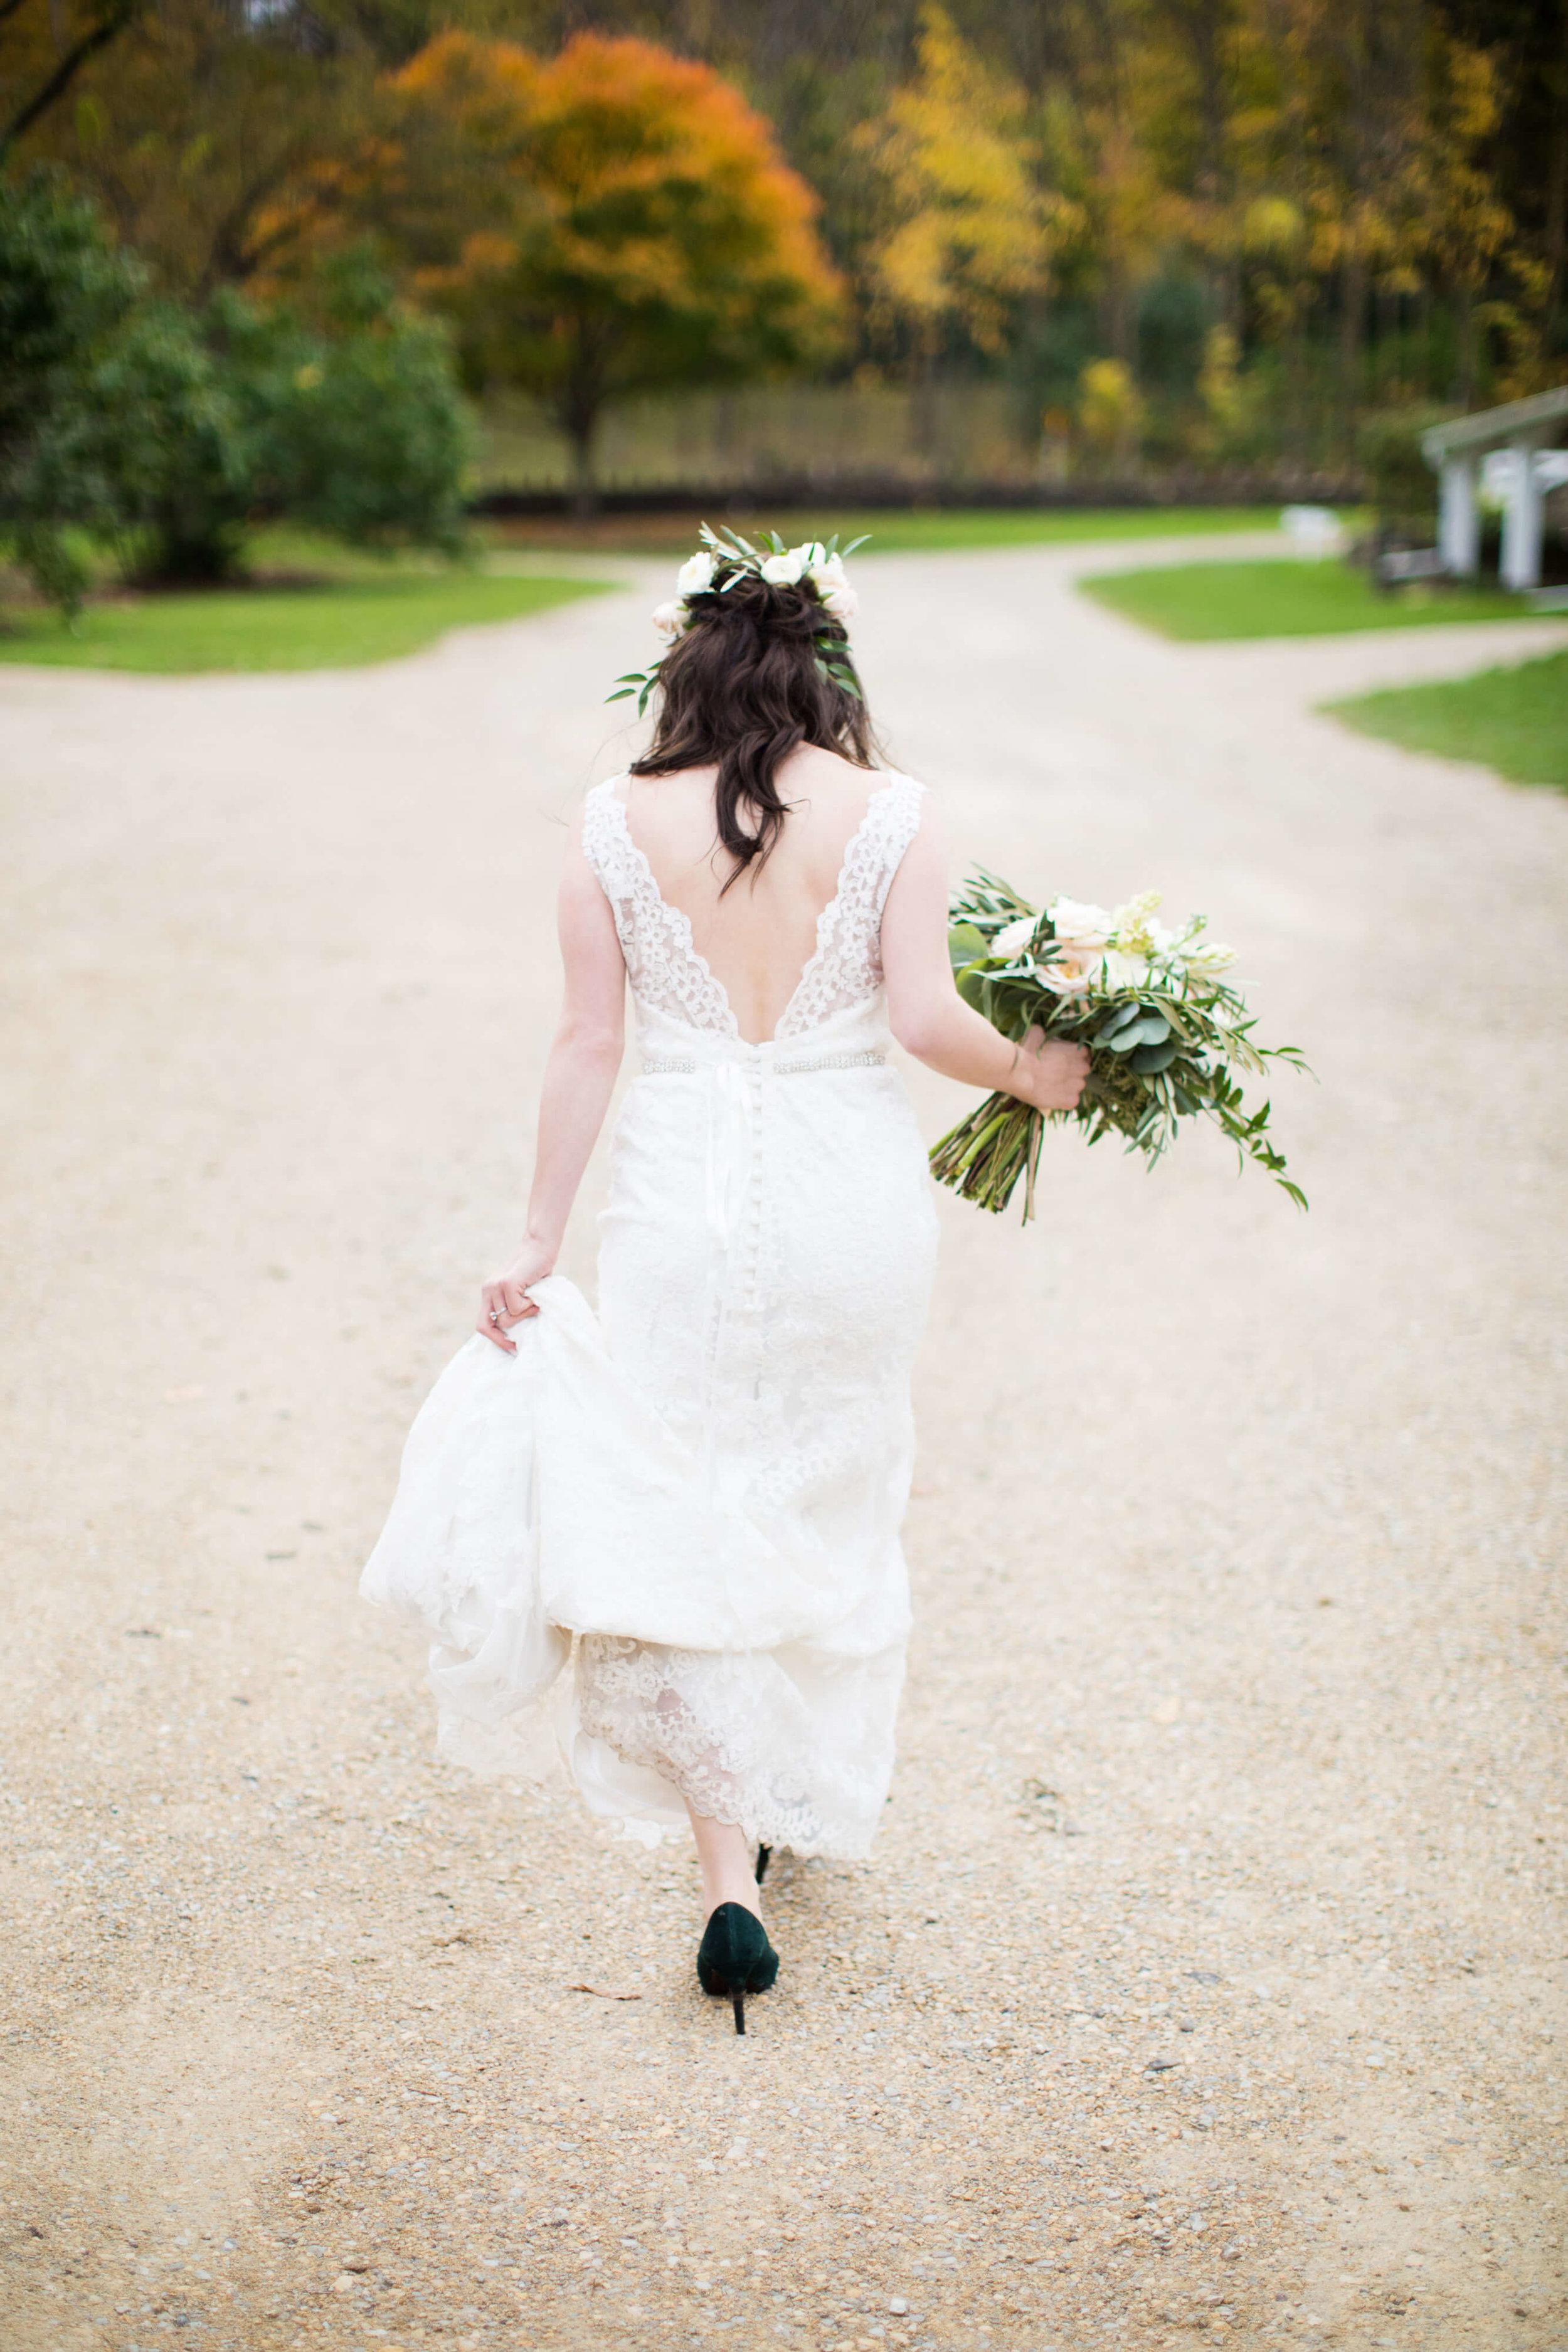 bride walking down the road | v back lace detail | Minnesota wedding photographer Studio KH wedding dress details | wedding blog | Sixpence Events 70 Ways to Photograph Your Wedding Dress.jpg